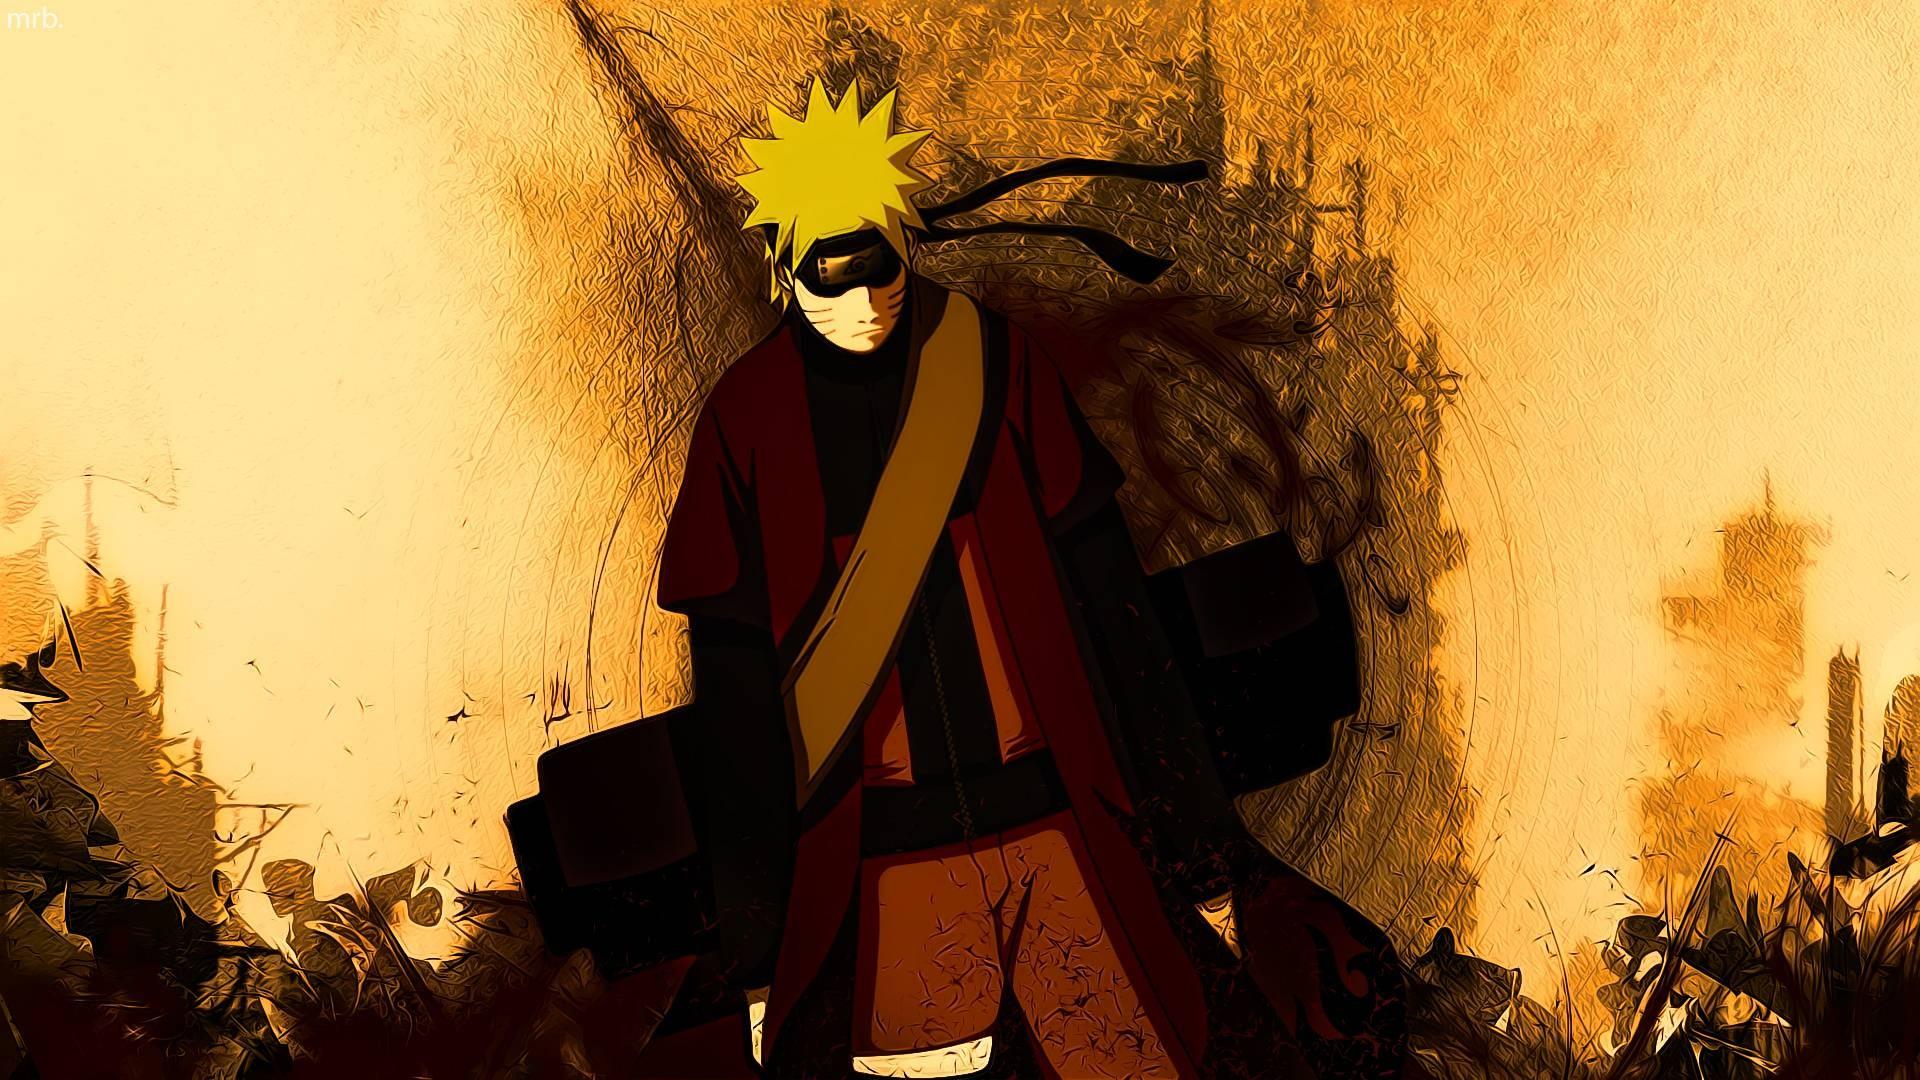 Amazing Wallpaper Naruto 1080p - 247140-free-naruto-hd-wallpaper-1920x1080-1080p  2018_464195.jpg